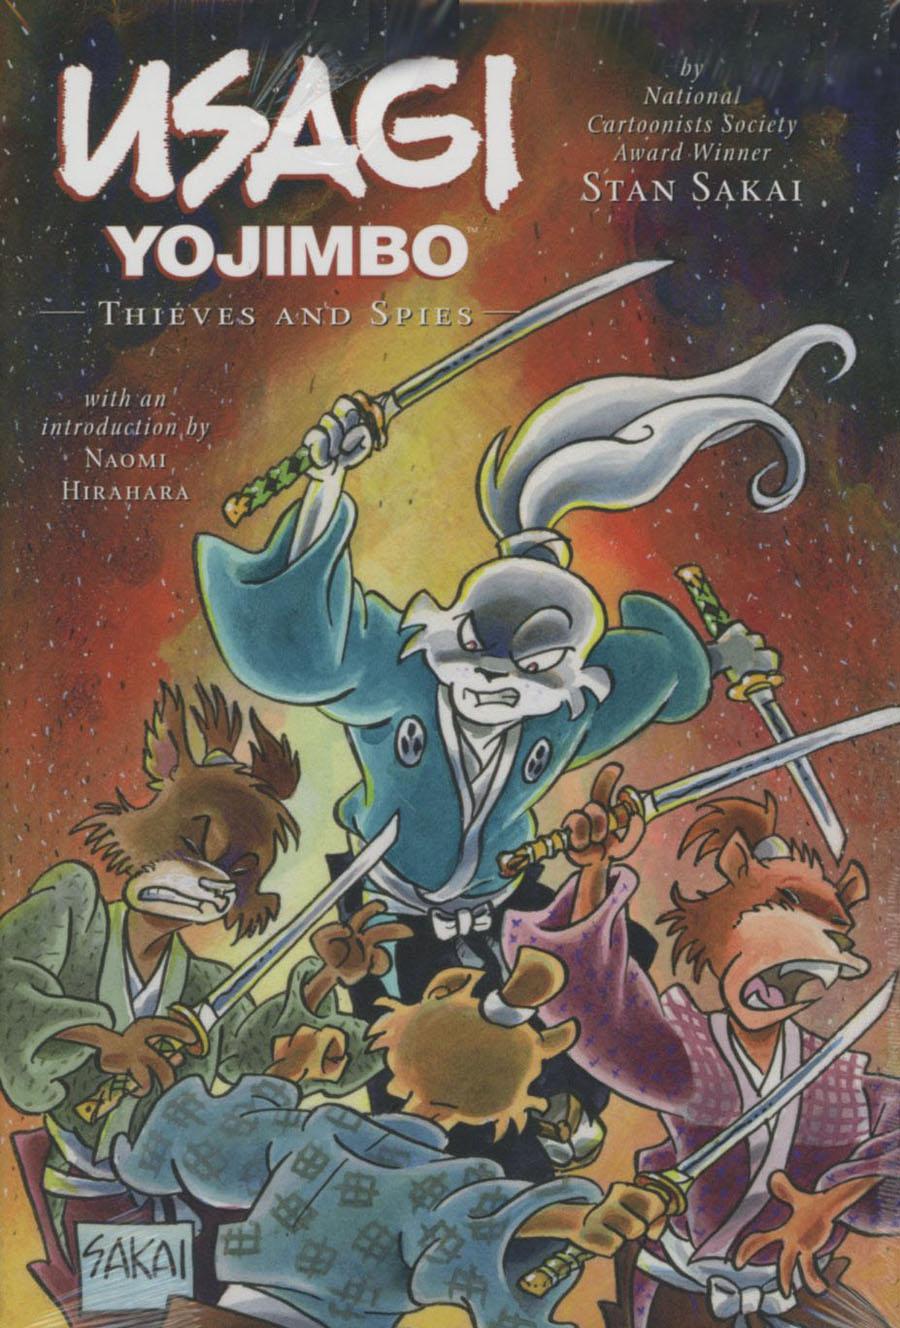 Usagi Yojimbo Vol 30 Thieves And Spies Limited Edition HC